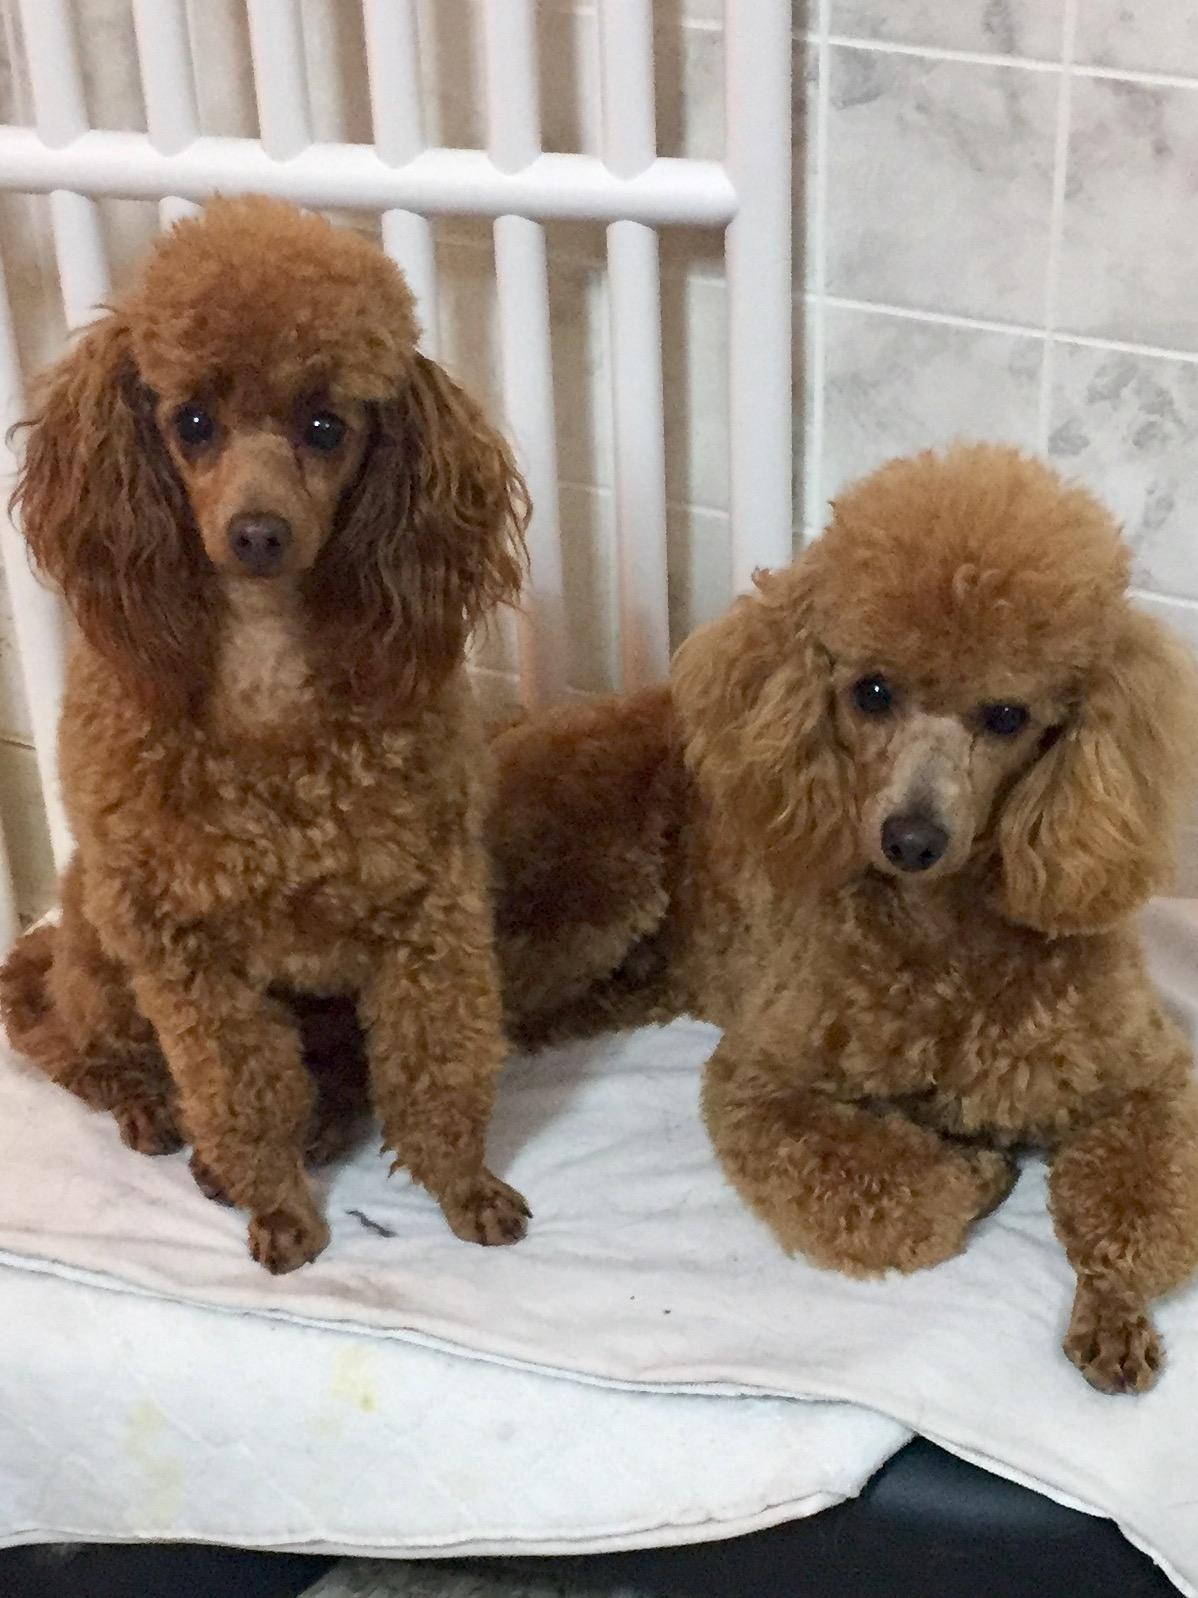 Puppies at Home, Primrose Poodles